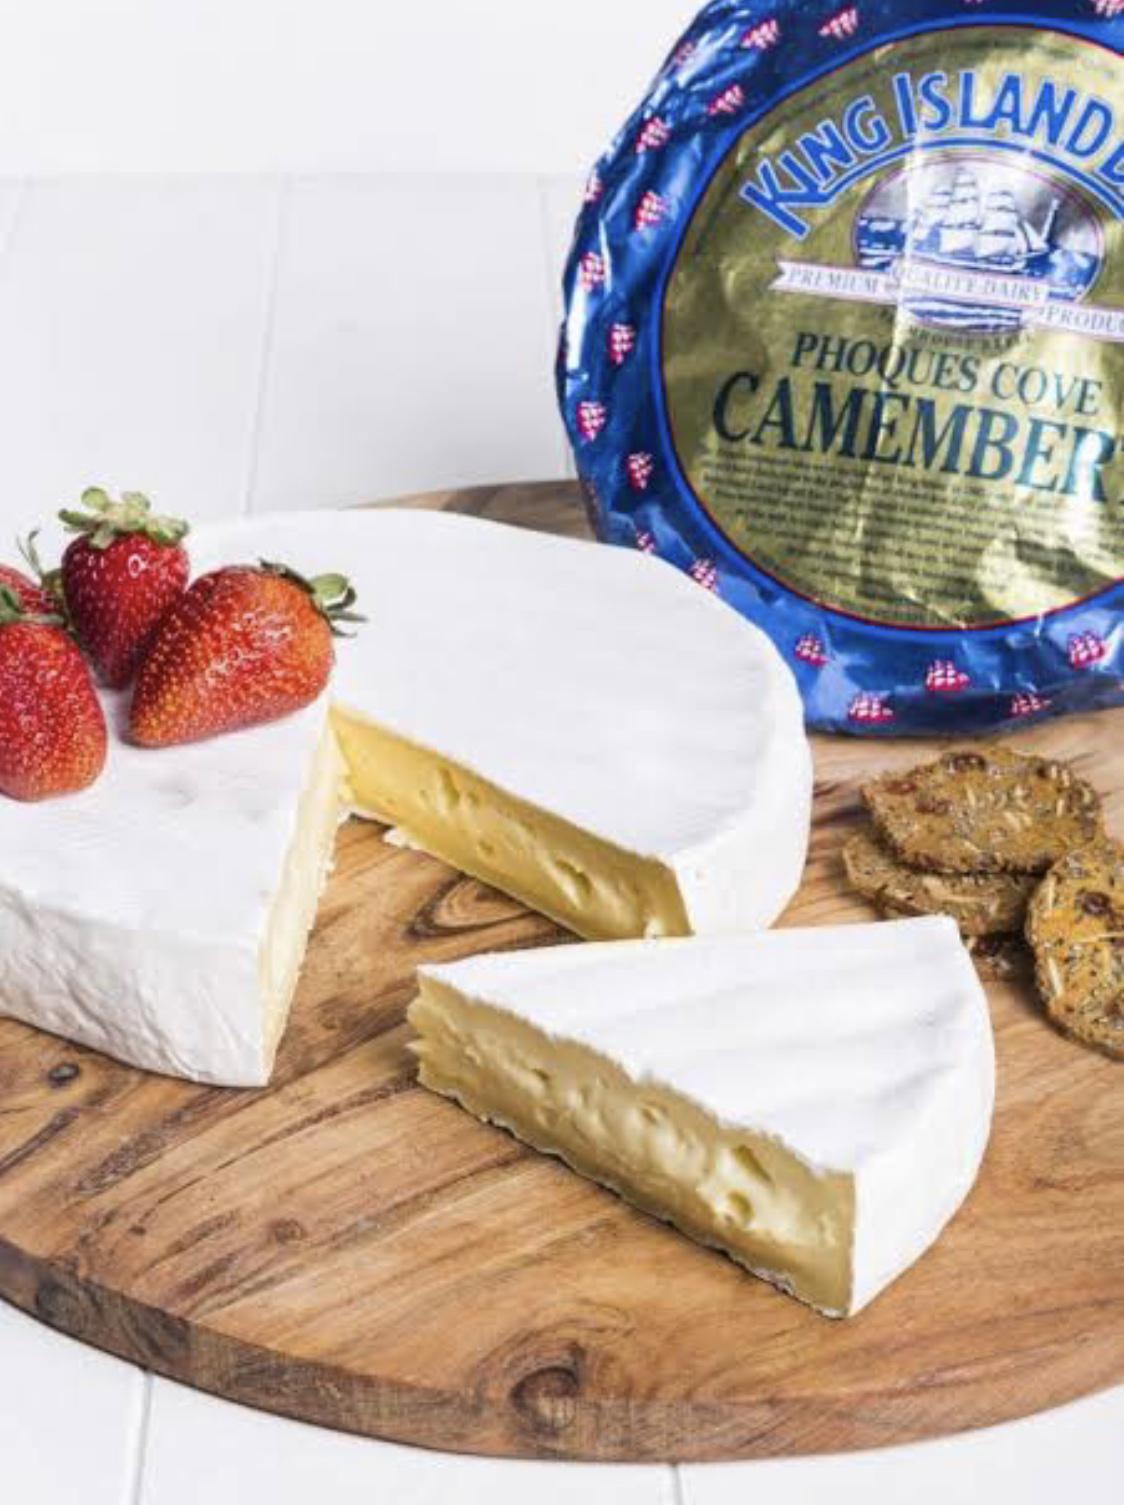 Phoques Cove Camembert